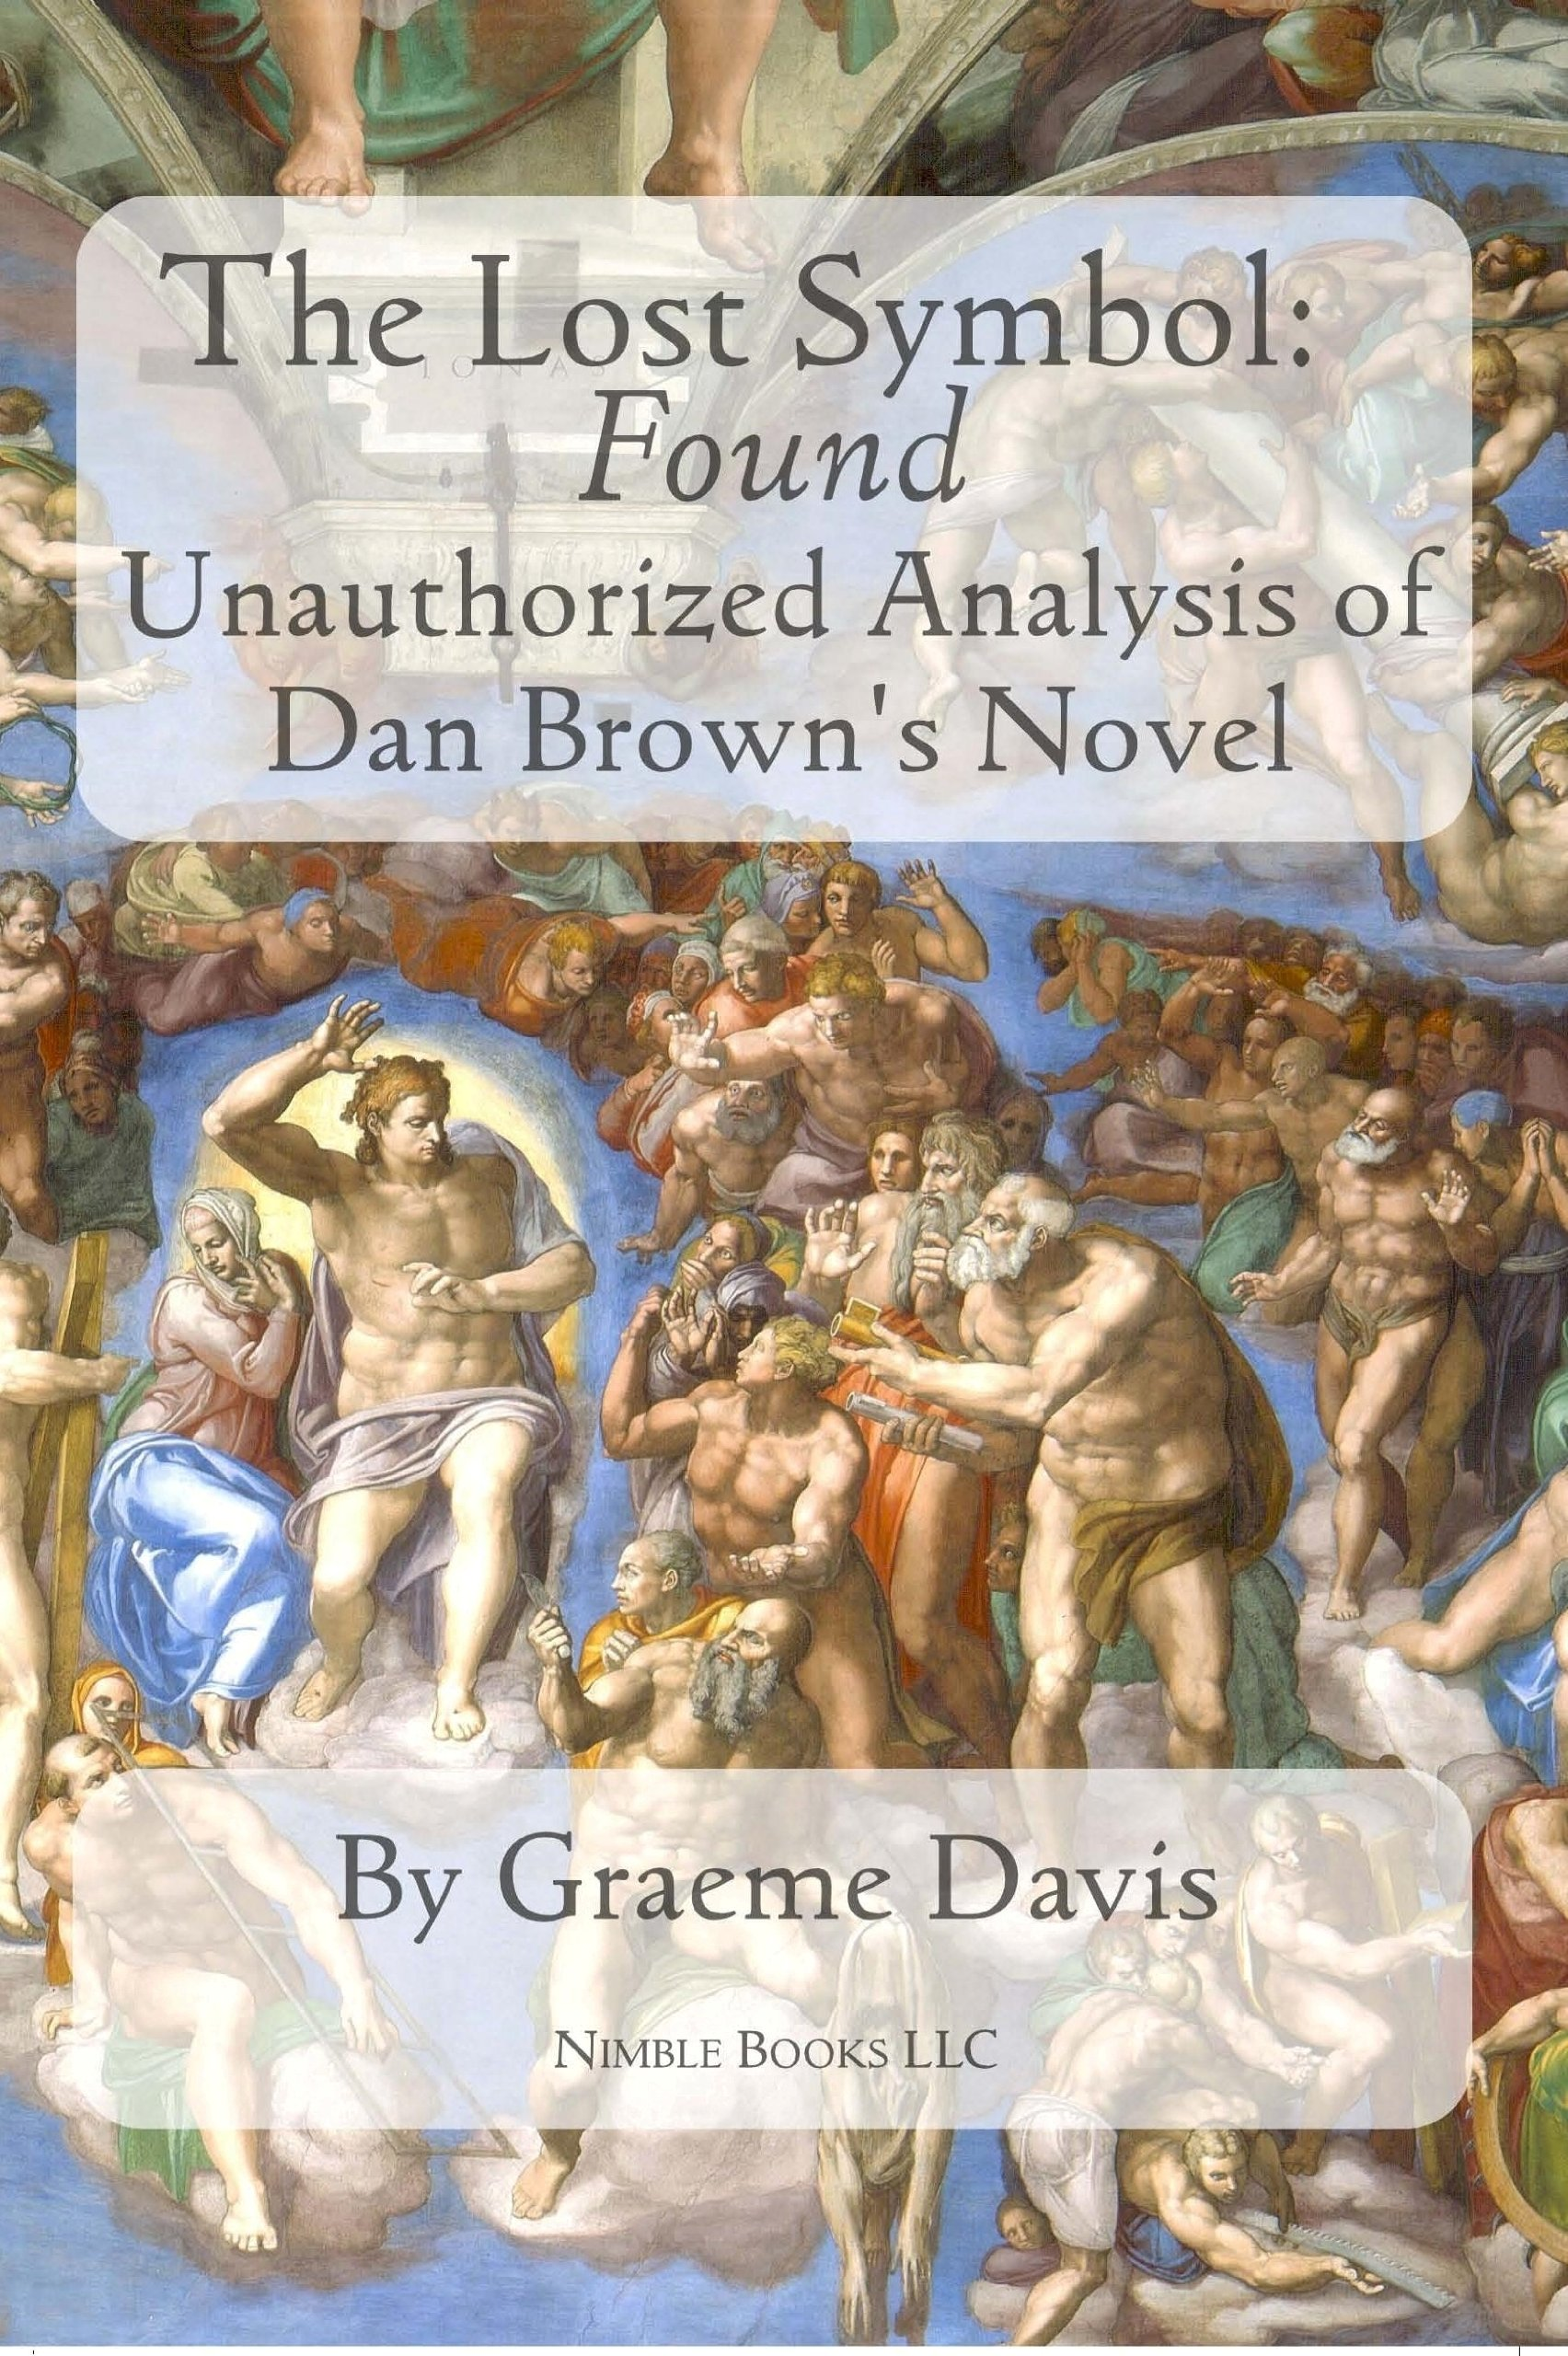 The lost symbol found unauthorized analysis of dan browns the lost symbol found unauthorized analysis of dan browns novel graeme davis 9781608880119 amazon books biocorpaavc